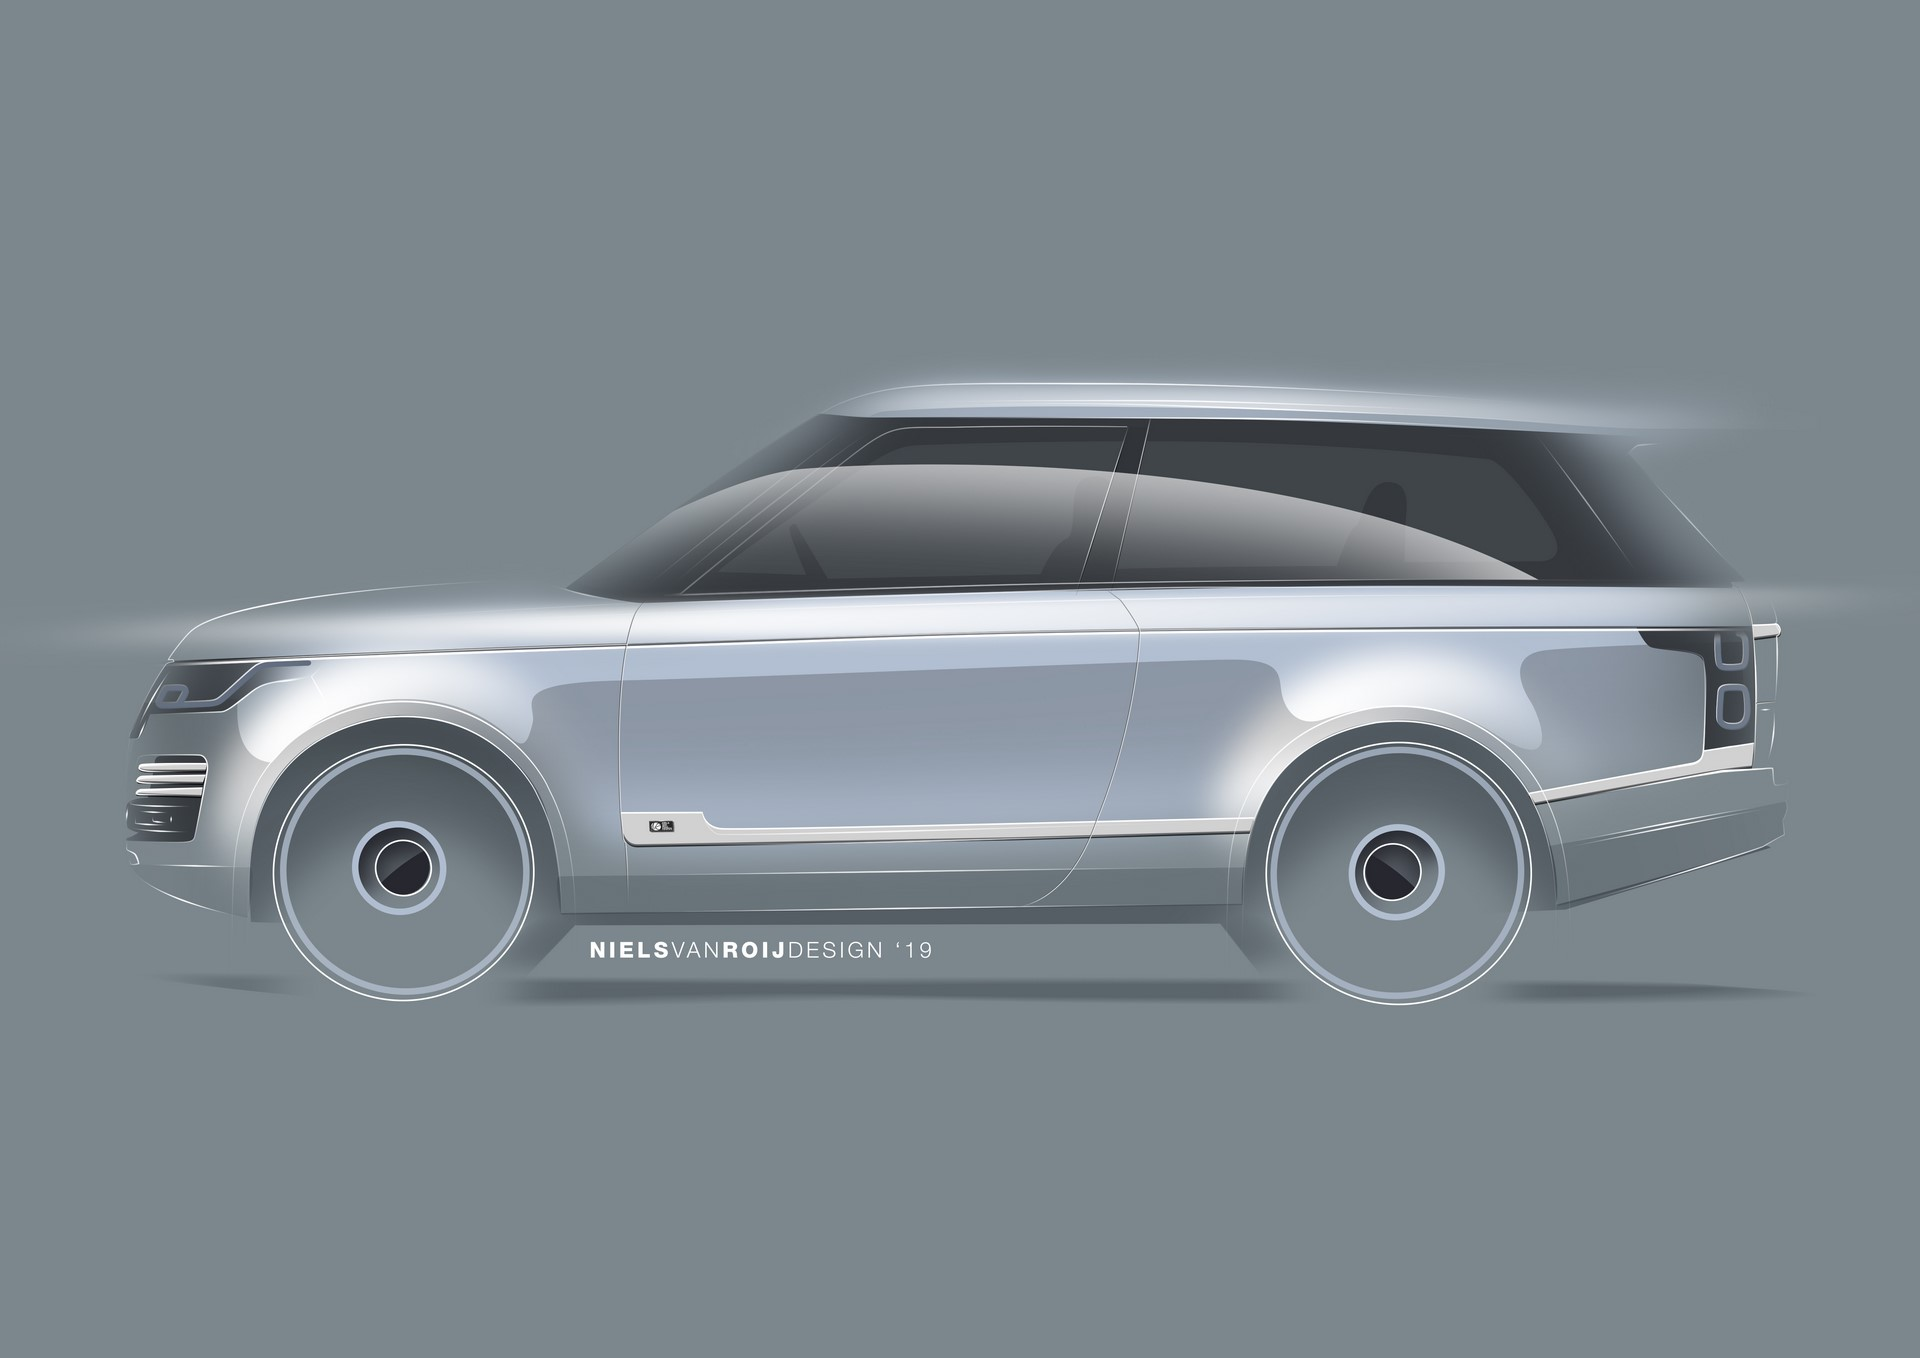 Range Rover Coupe by Niels van Roij Design (1)